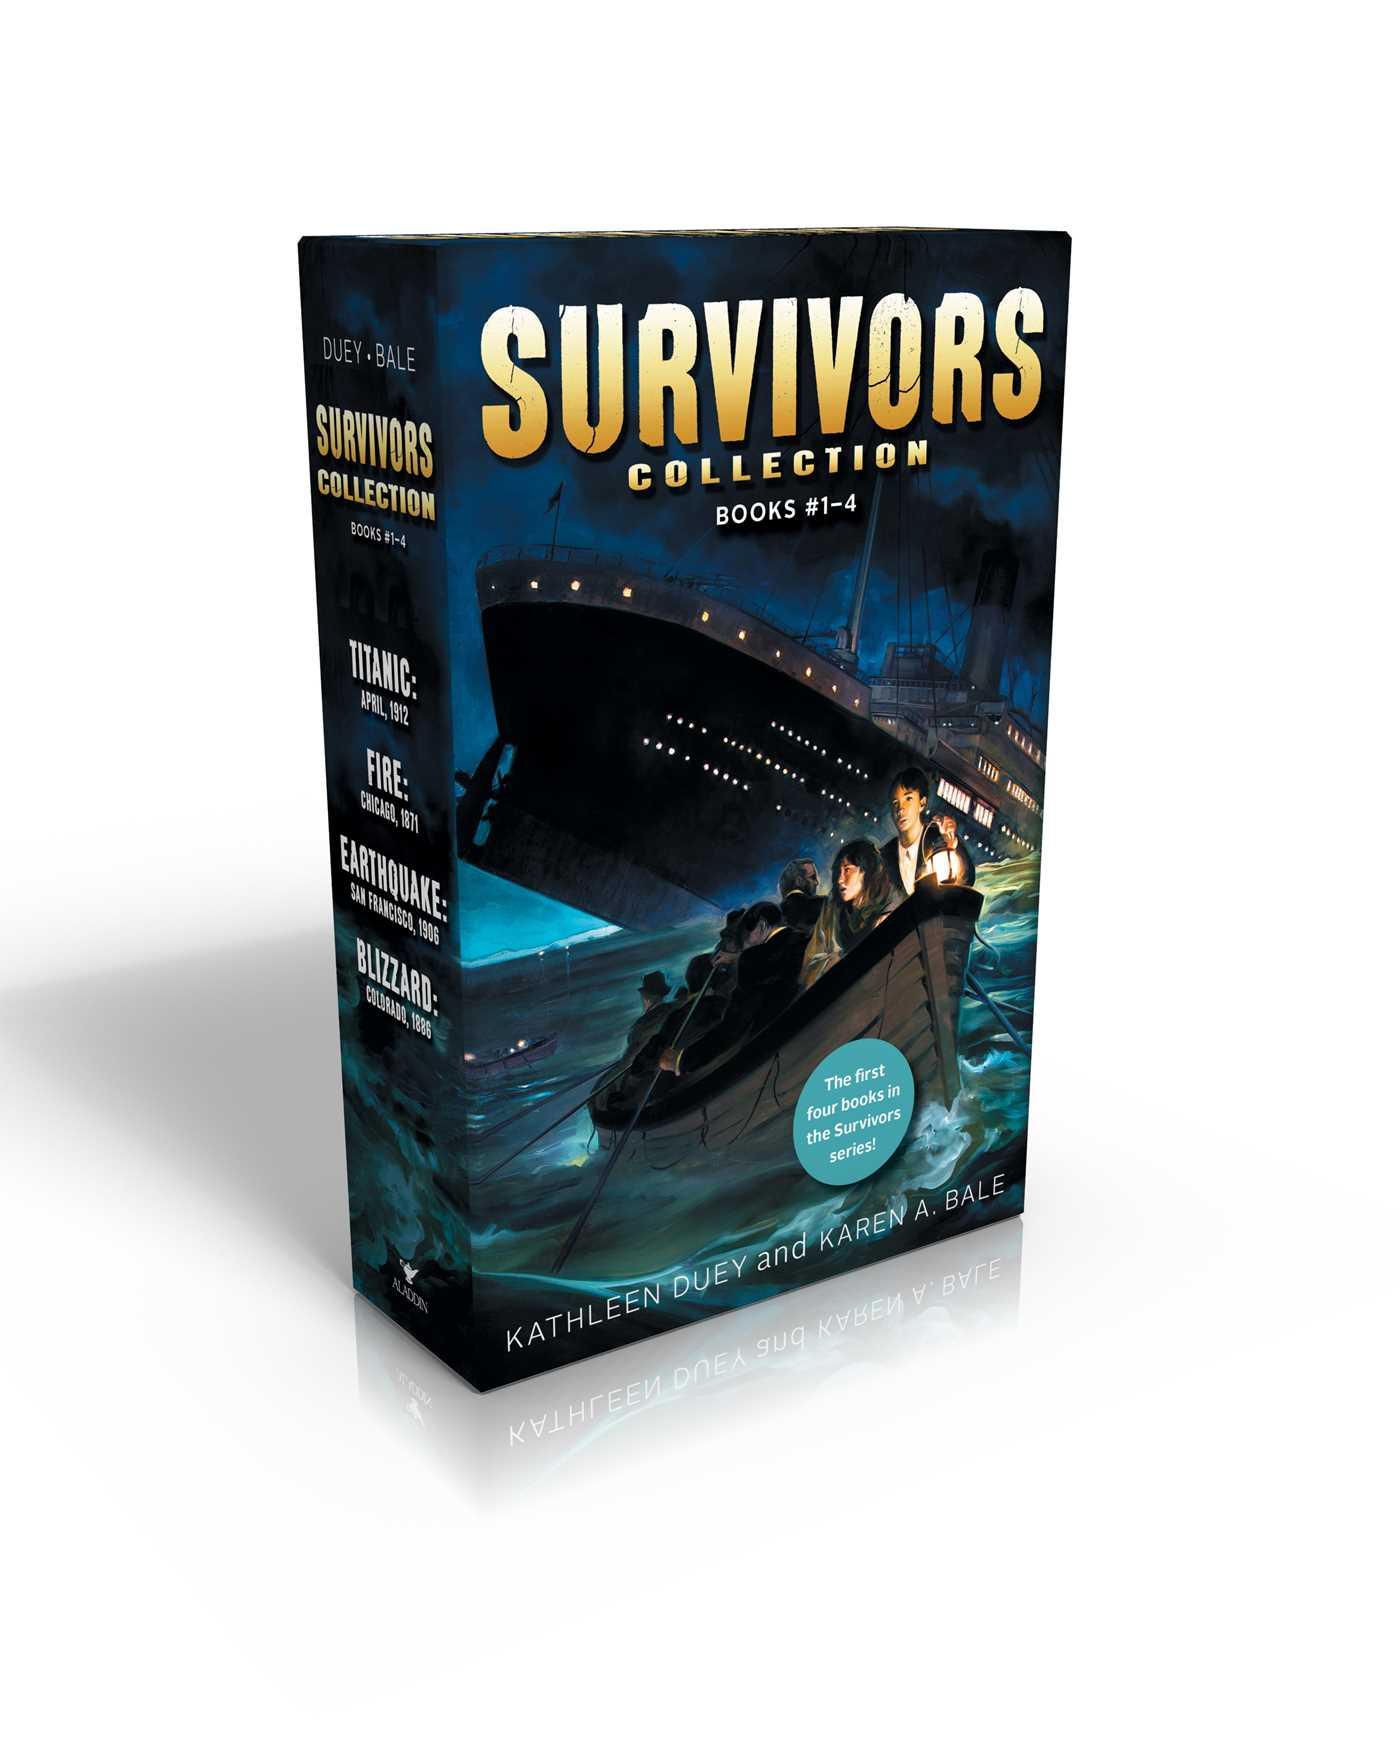 Titanic Survival! Series Book 1 Kathleen Duey Karen A